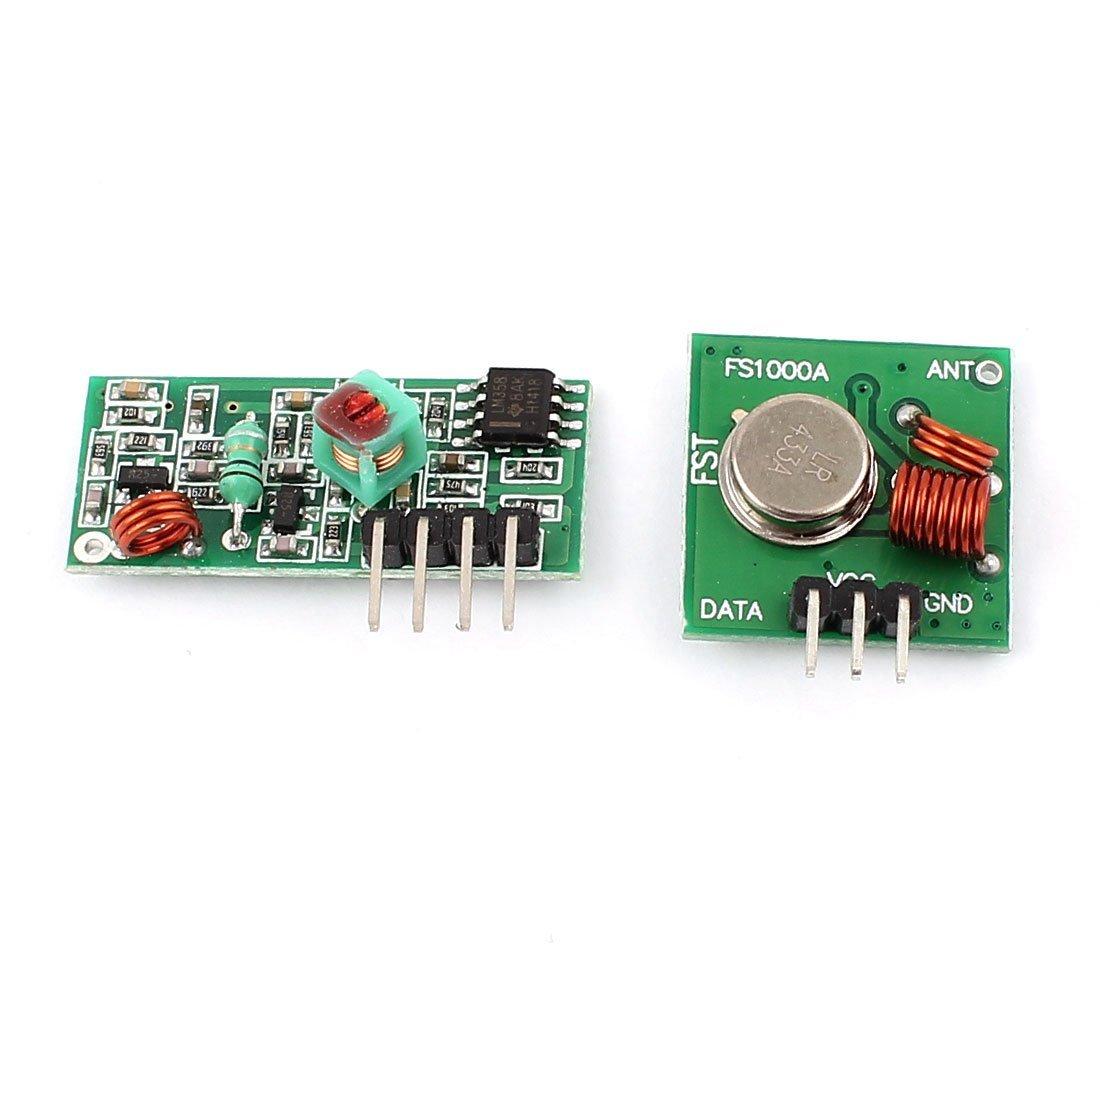 eDealMax a15042500ux0023 transmisor RF WL Con el Kit Módulo receptor Para ARM MCU inalámbrico, 433 MHz